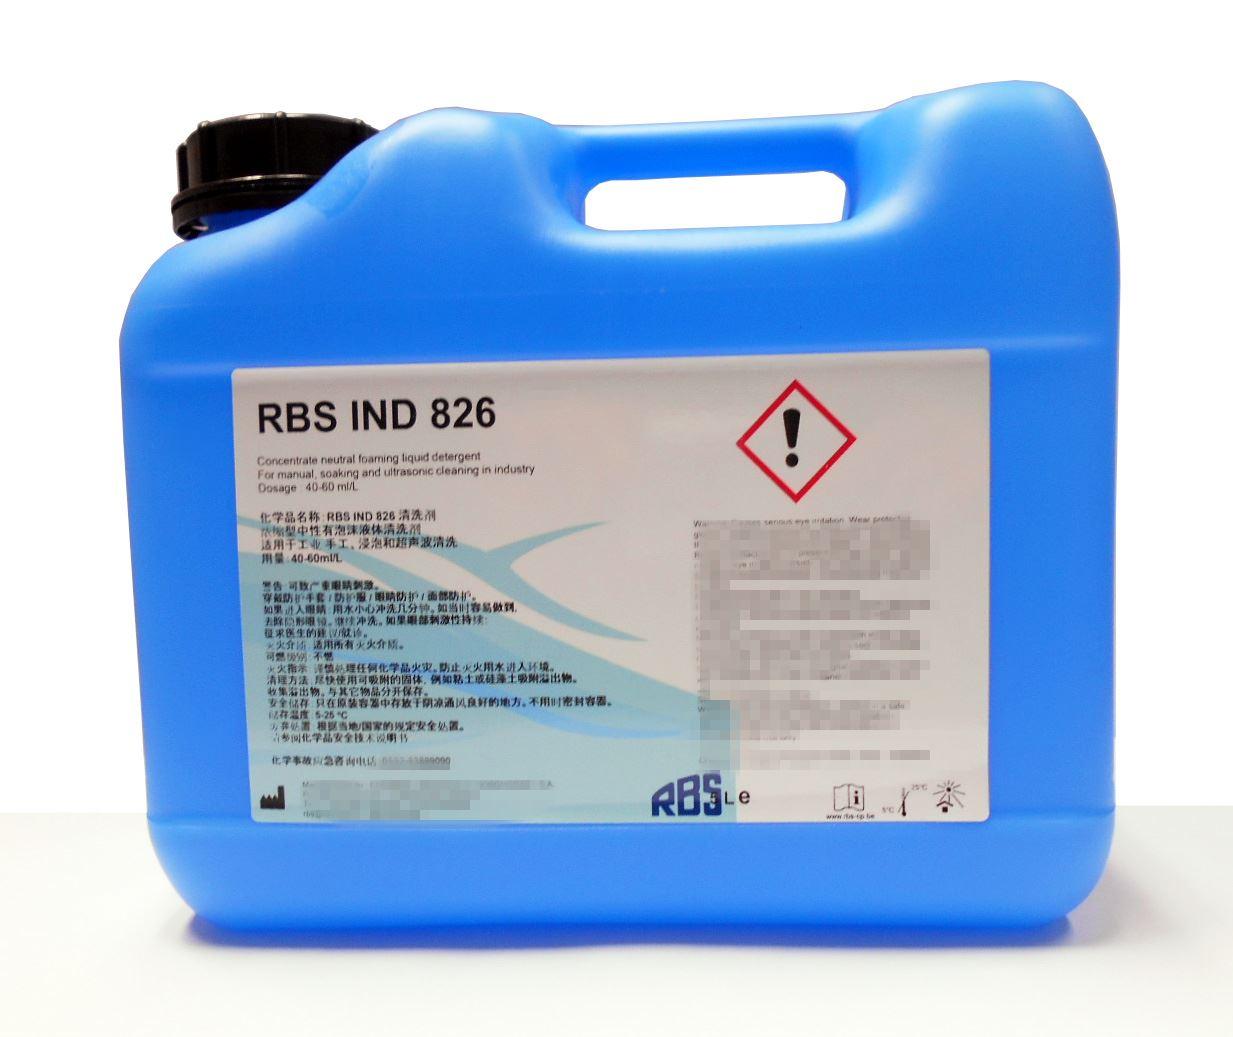 RBS IND 826_IM.jpg RBS清洗液及中和剂 清洗液、中和液 第10张